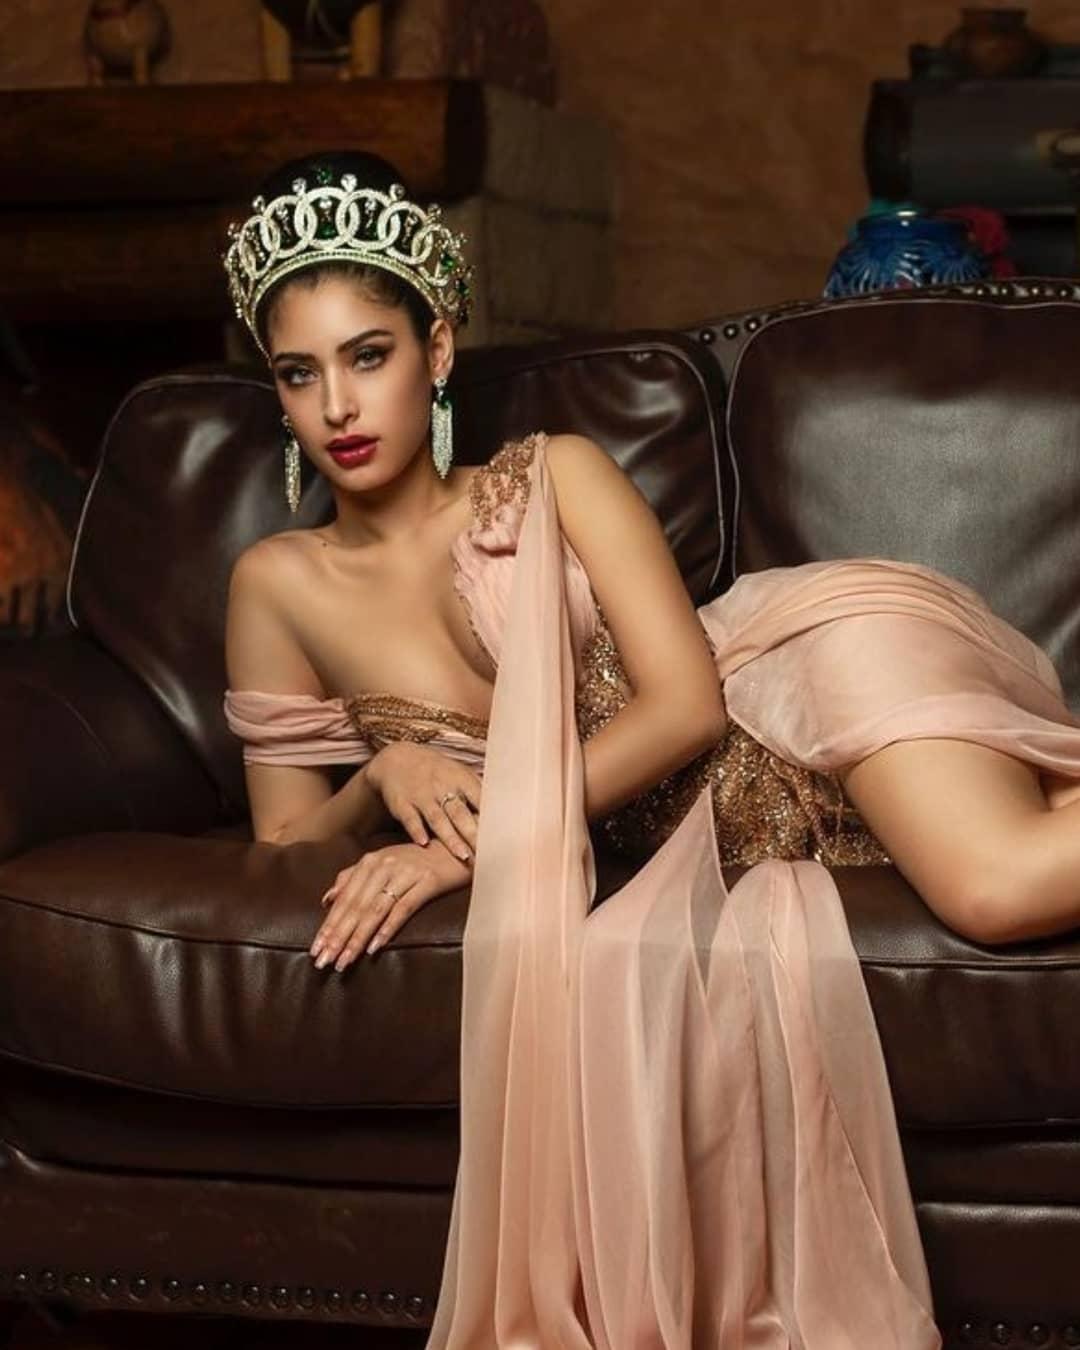 angela leon yuriar, miss grand mexico 2020. - Página 7 Wps2x10